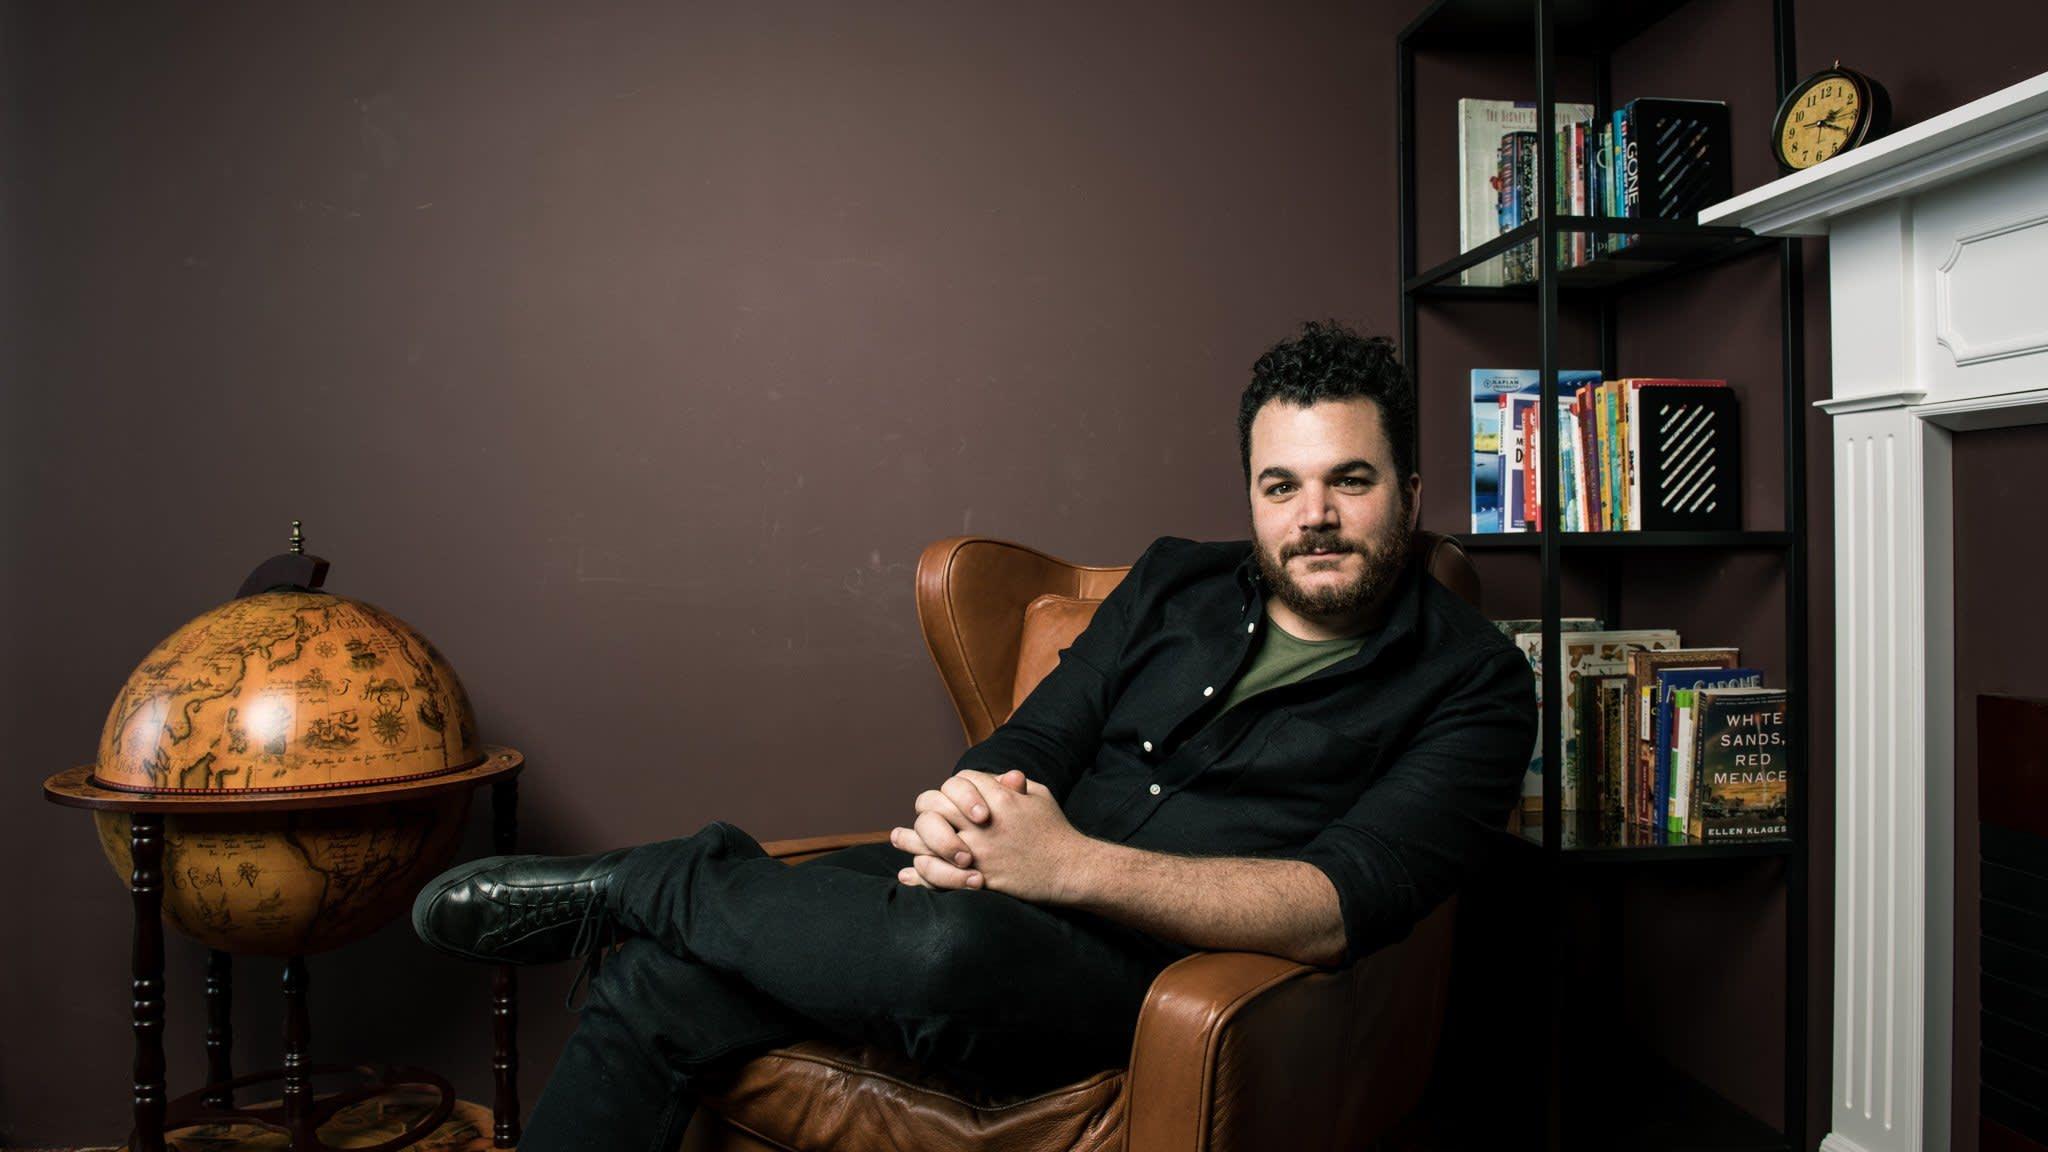 Houseparty founder Ben Rubin: 'I'm OK with Facebook'